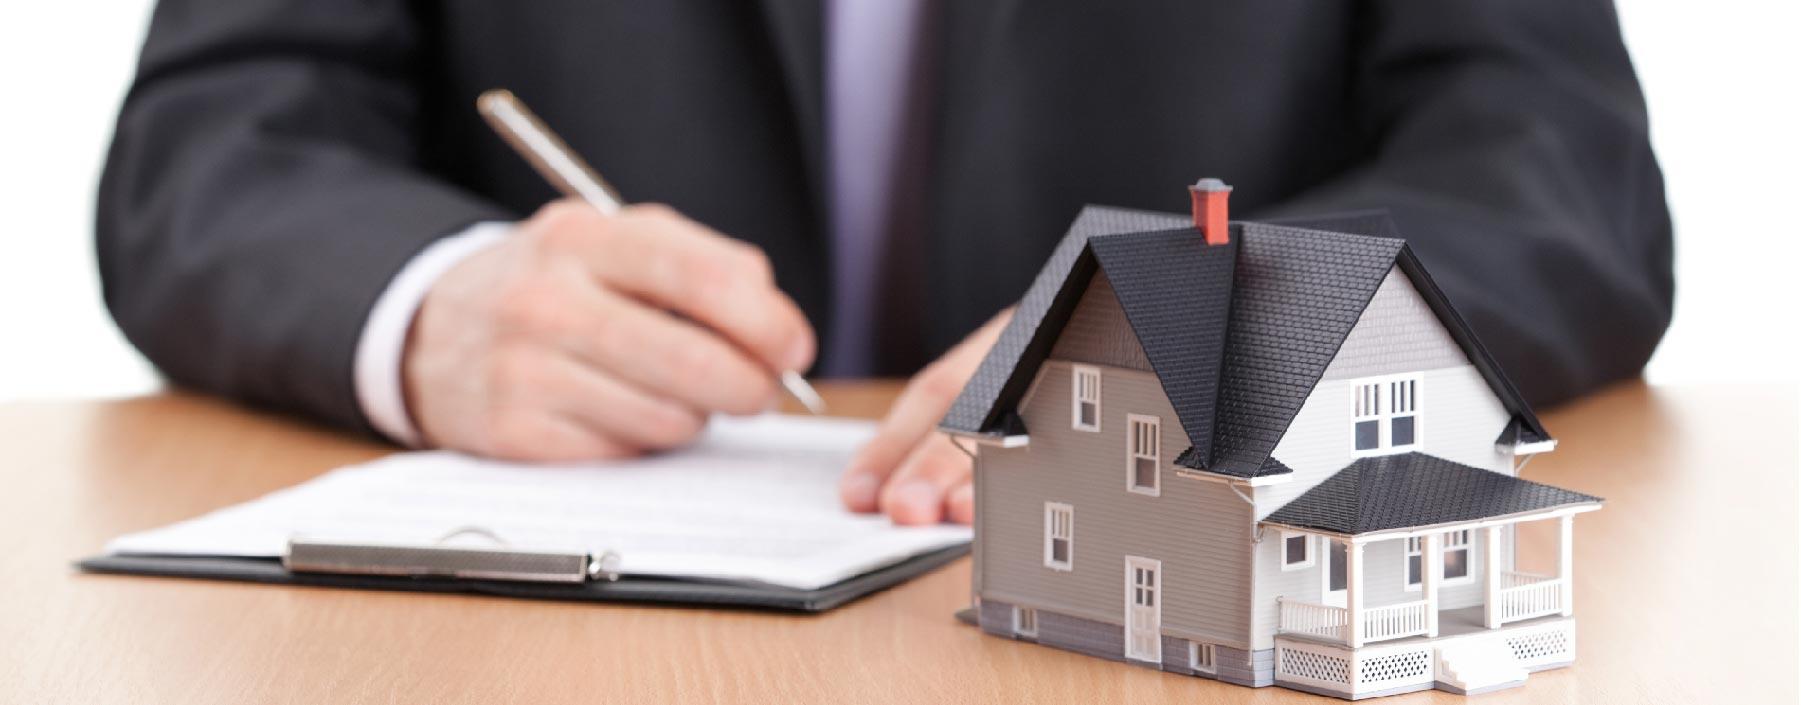 Mortgage Free Faster Nathan Janzen